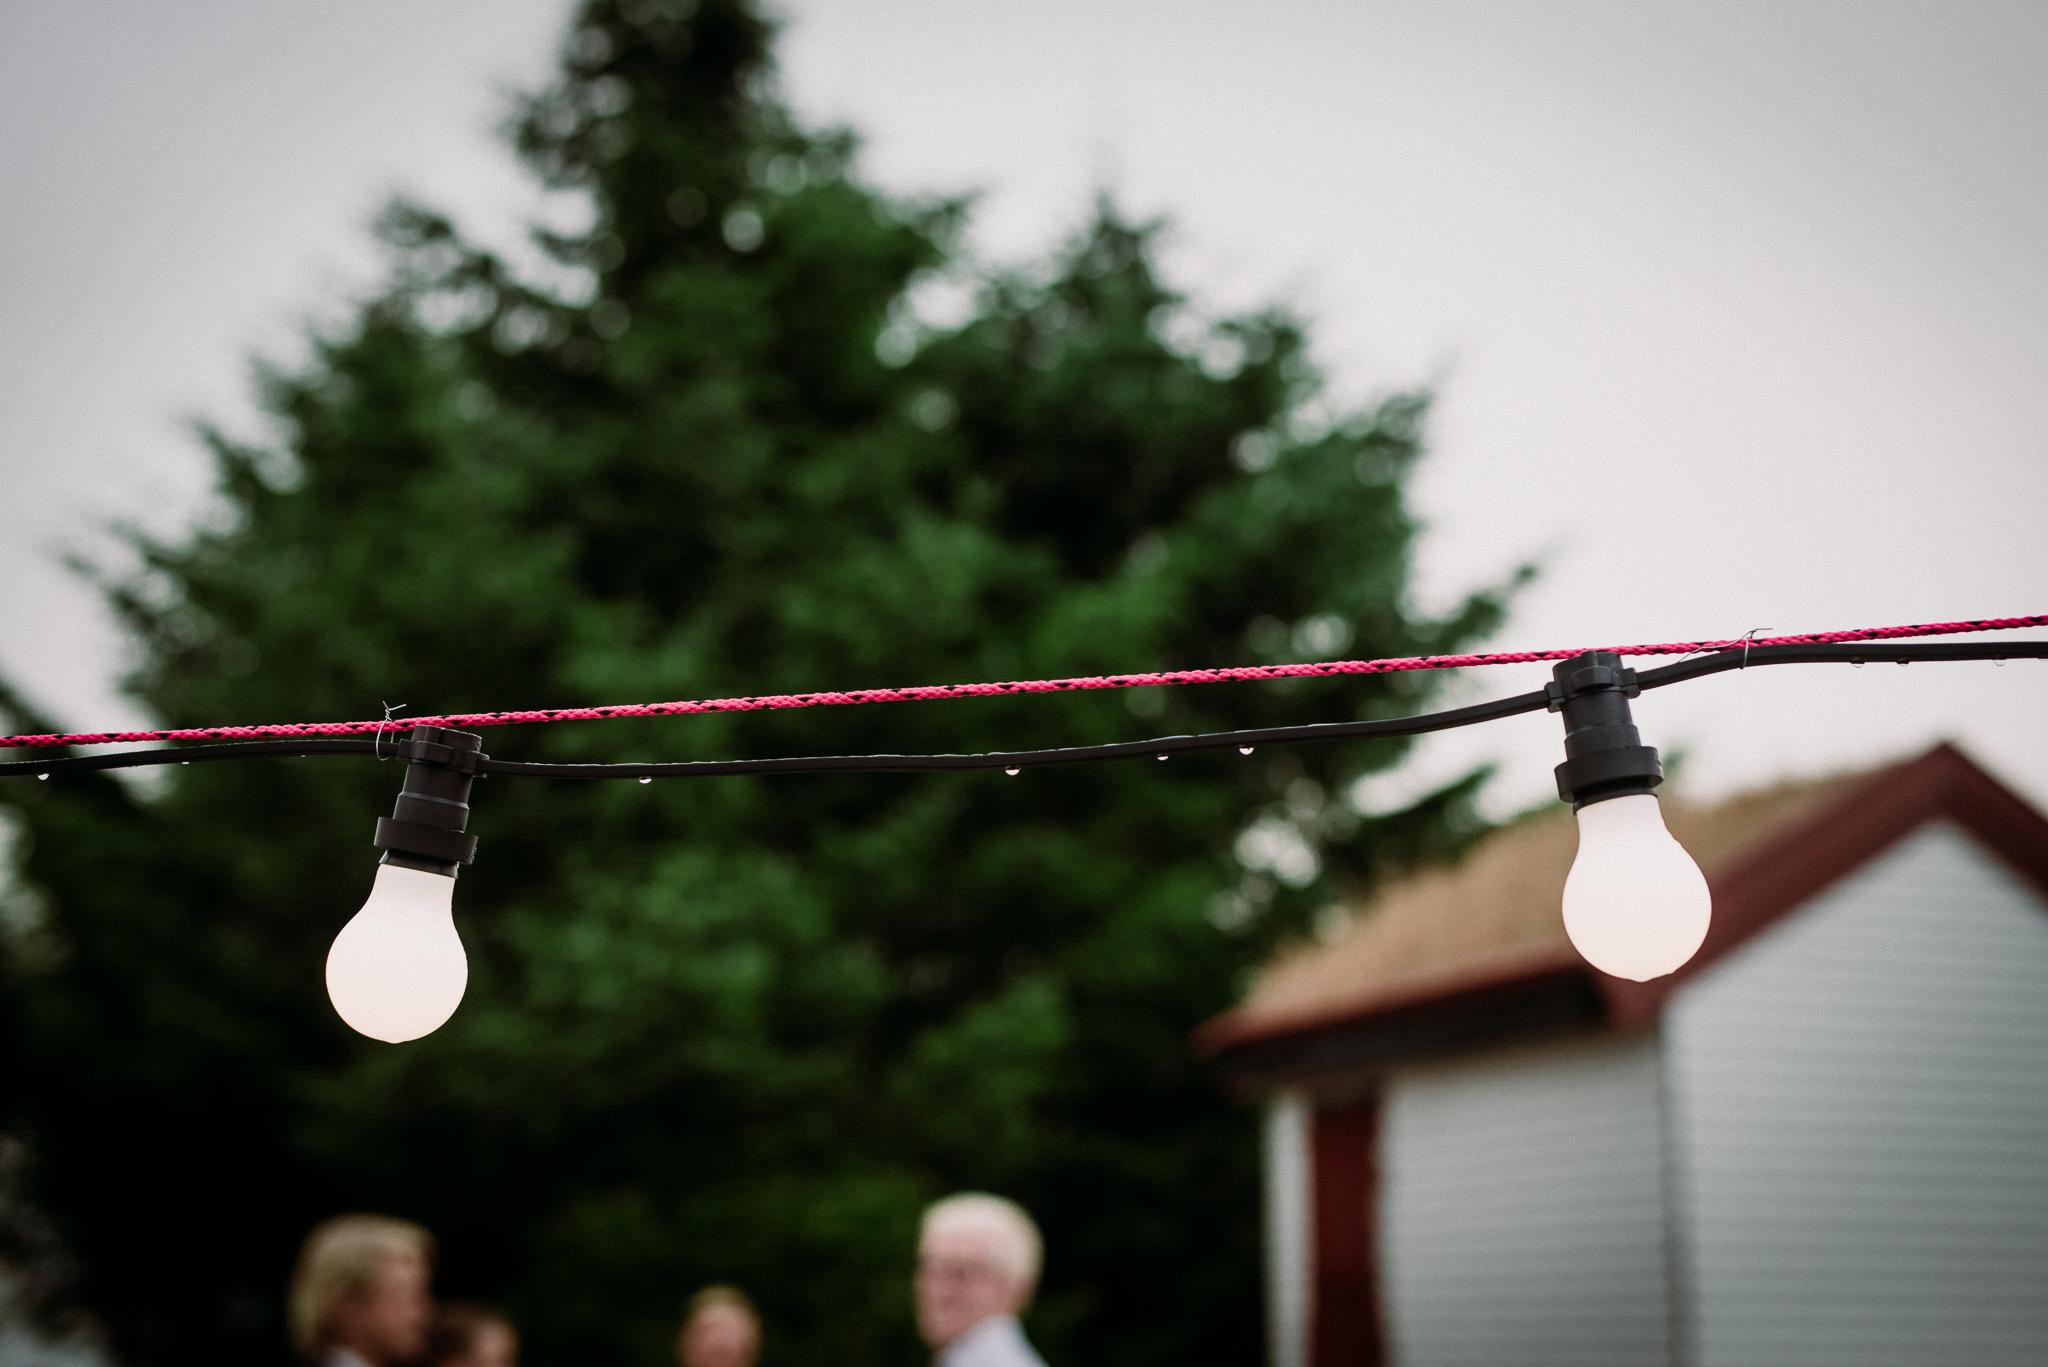 Bryllup-løen-på-sunde-bryllupsfotograf-Stavanger-Lofoten-Bergen-Oslo-55.jpg